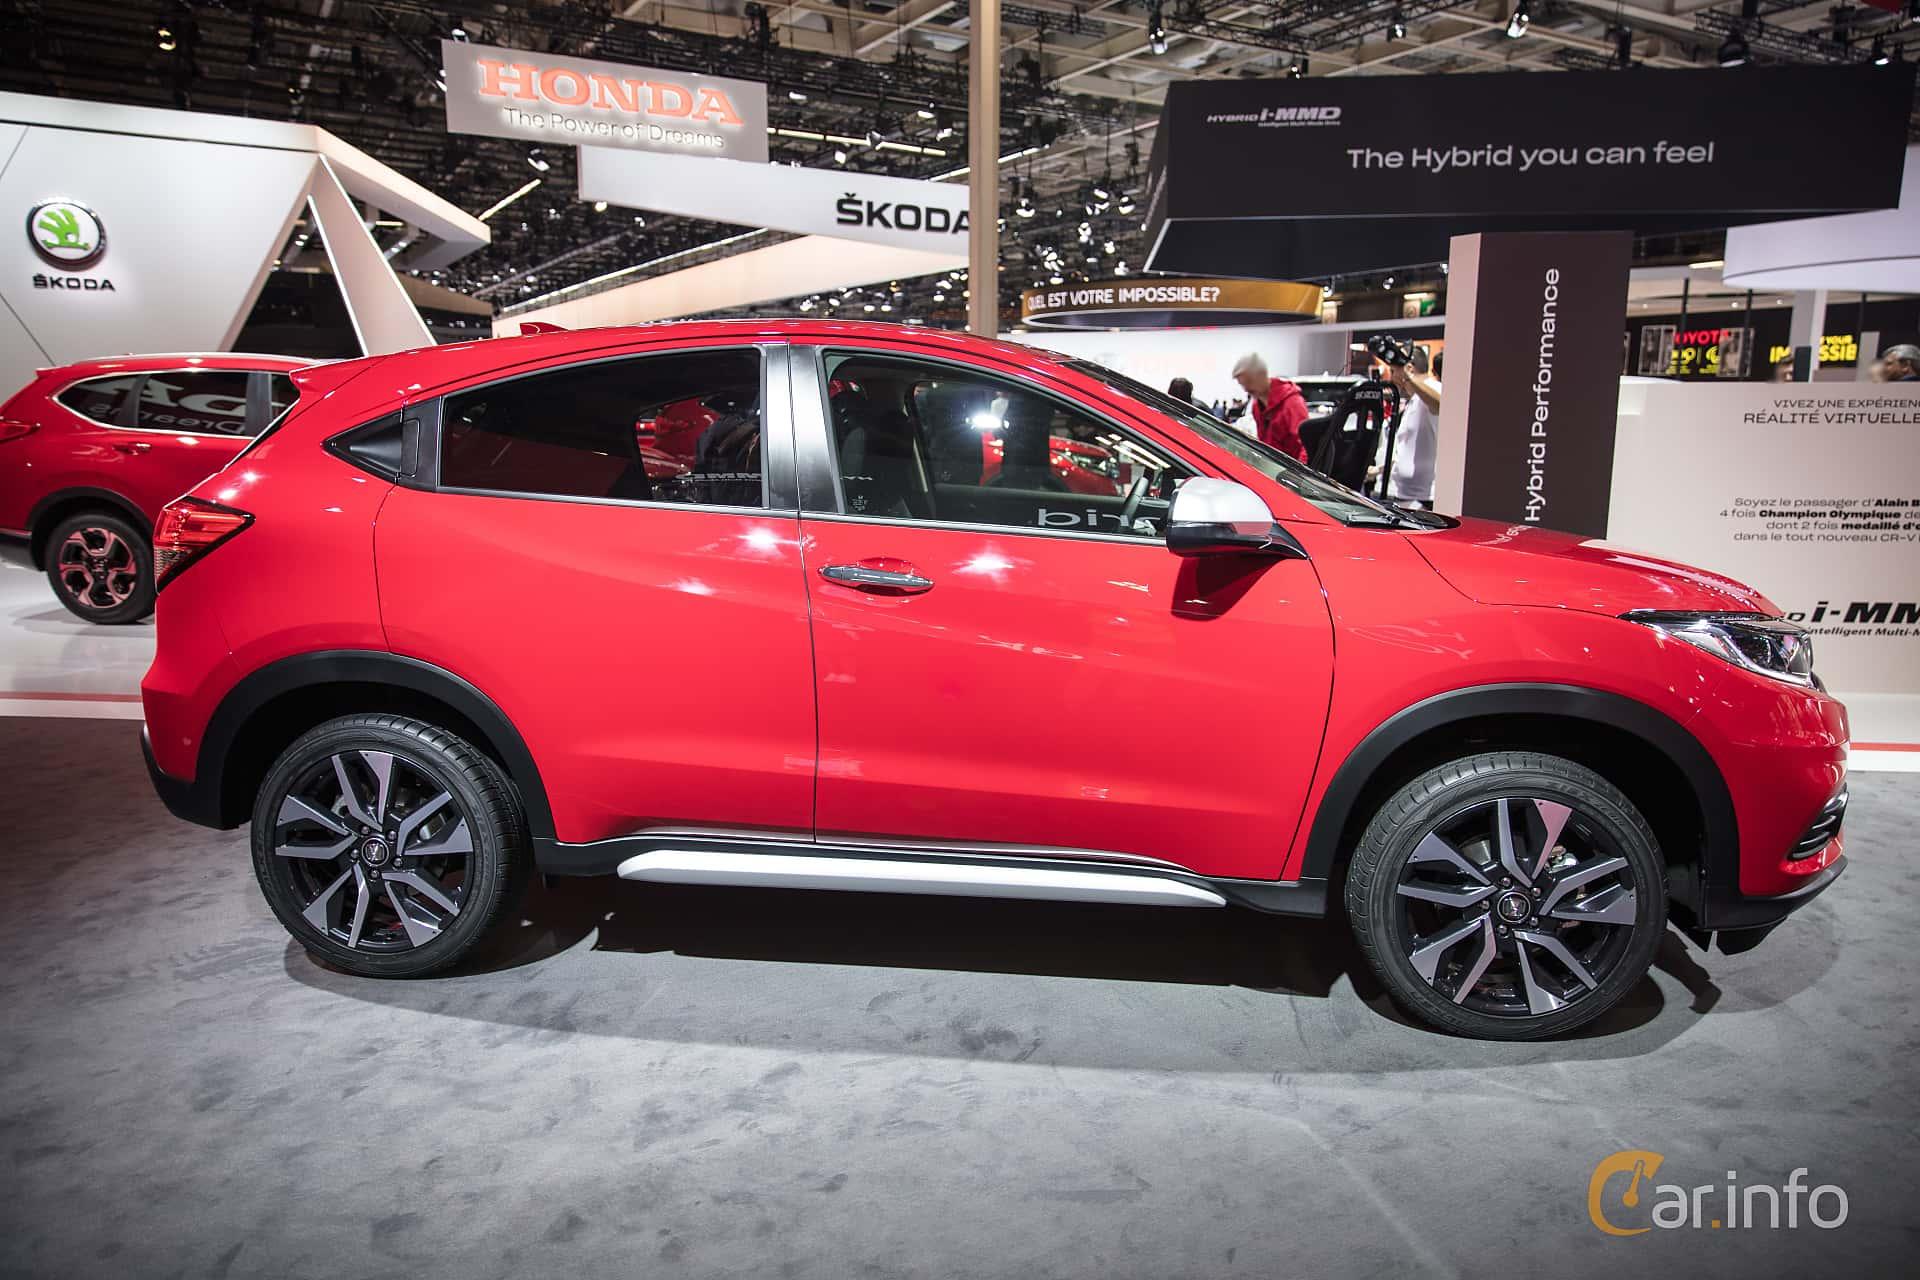 Honda HR-V 1.5 i-VTEC Manual, 130hp, 2019 at Paris Motor Show 2018